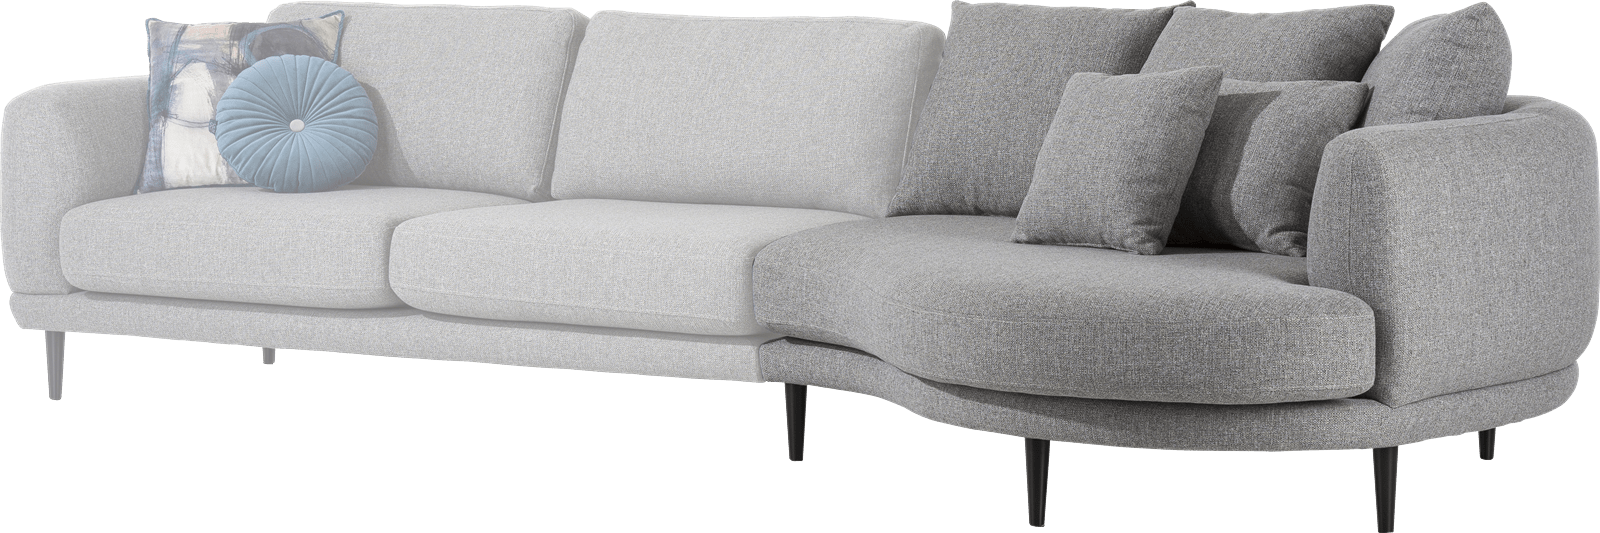 Henders and Hazel - Portland - Modern - Banken - lounge end inclusief 3 rugkussens big - rond - rechts